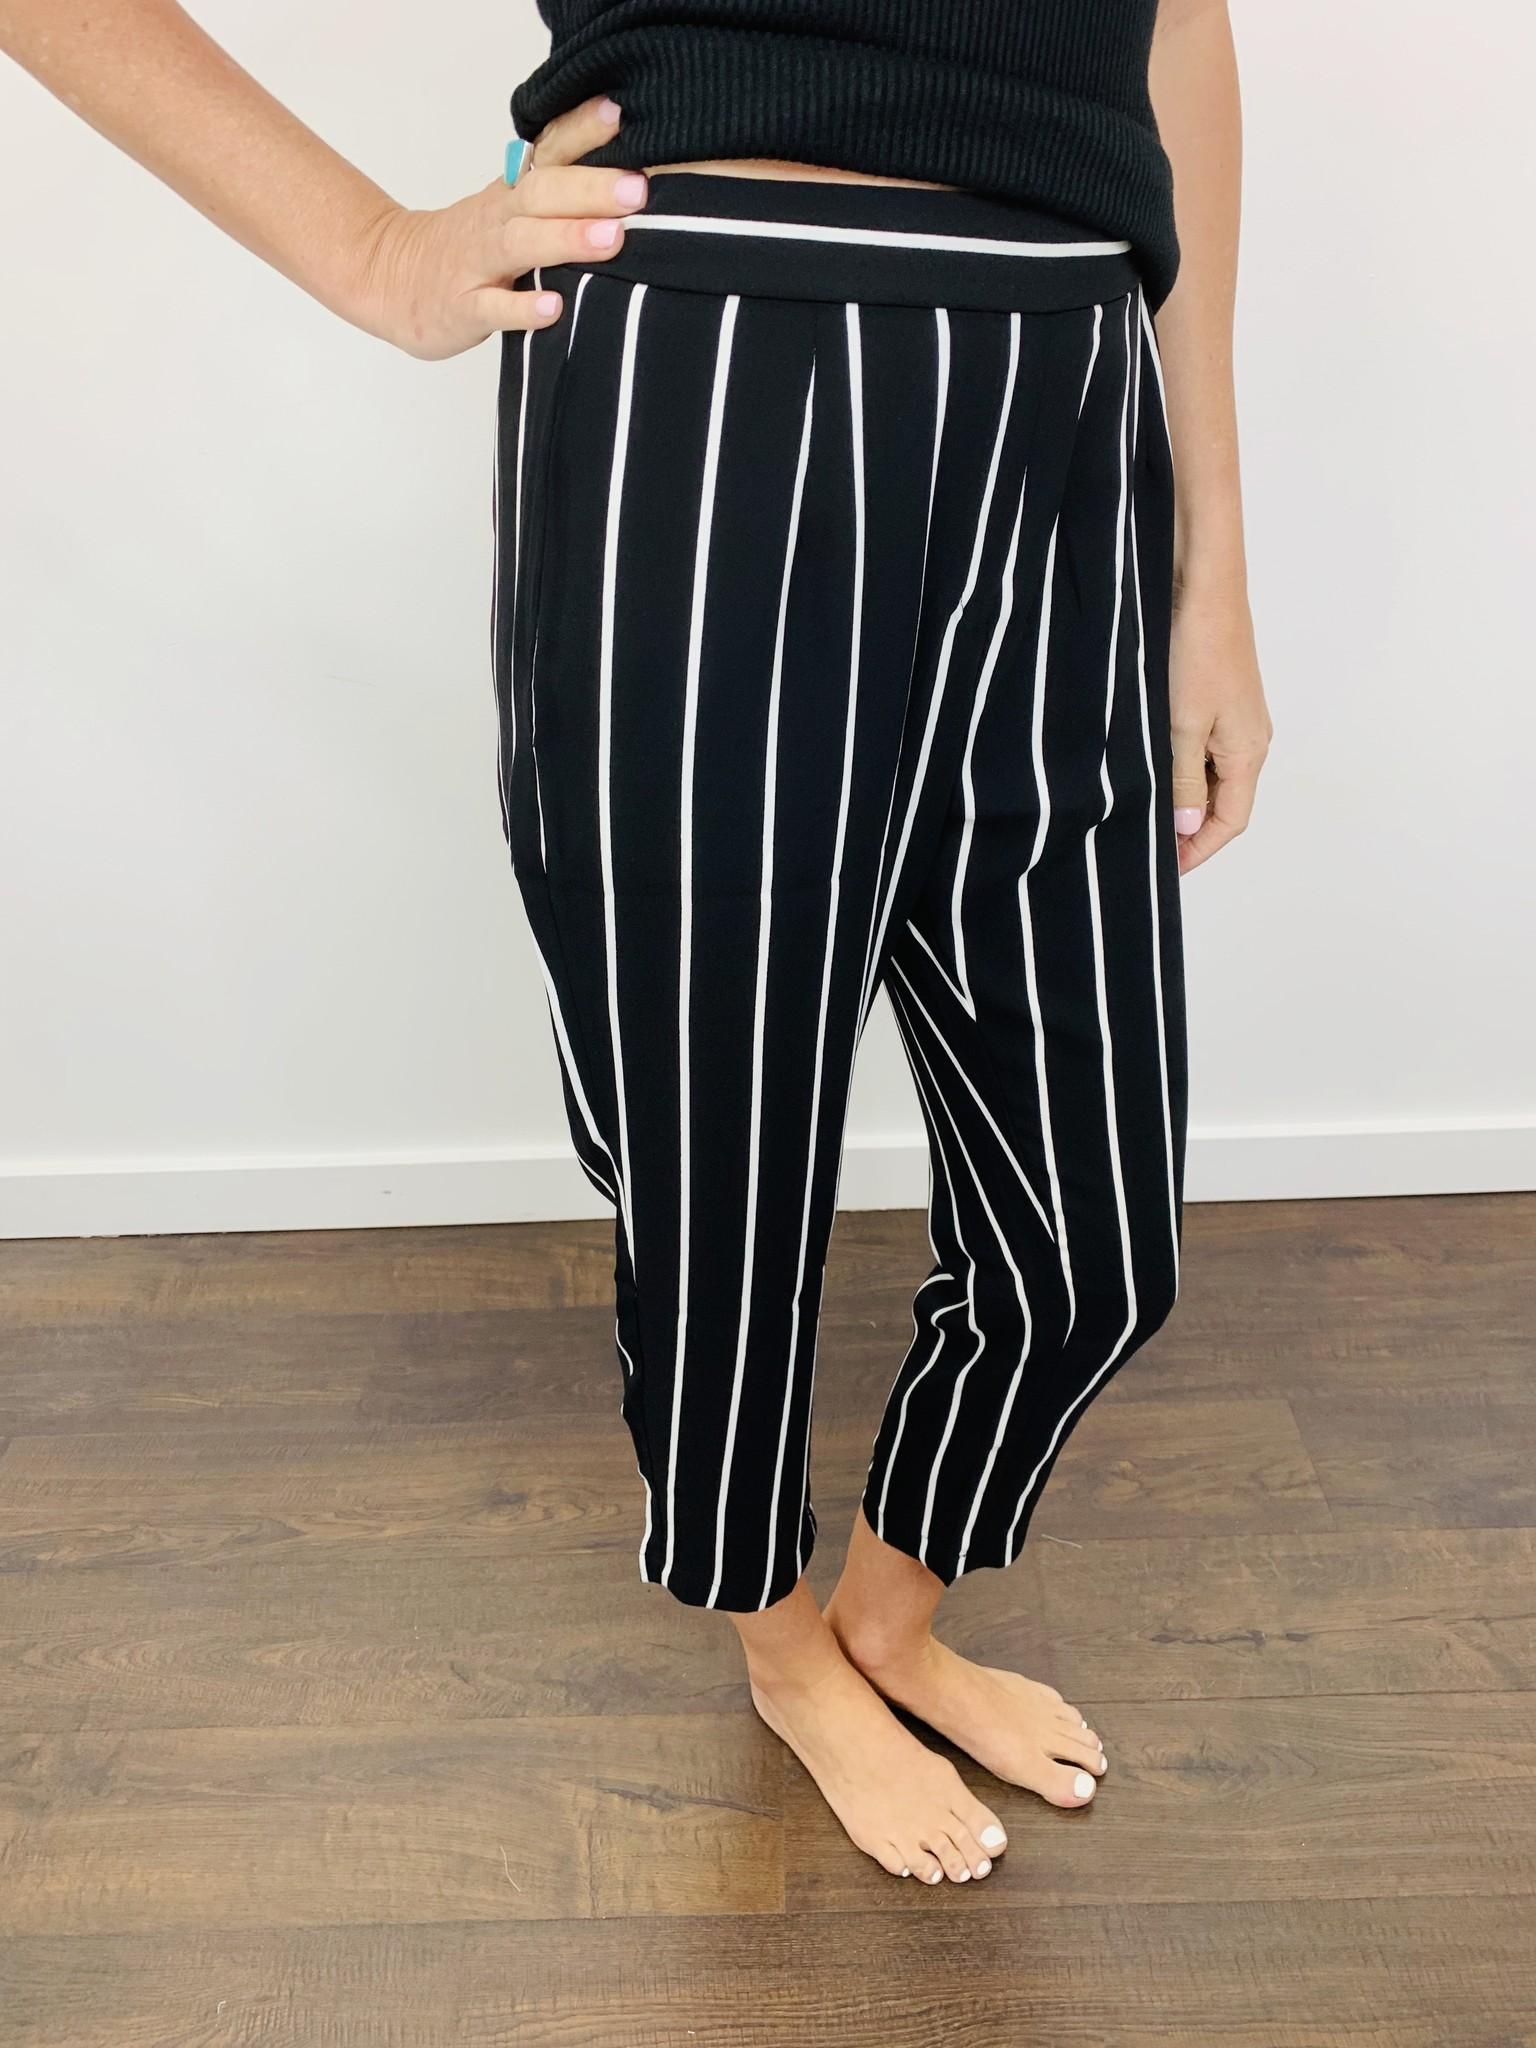 Orb Sasha Pant in Black and White Stripe